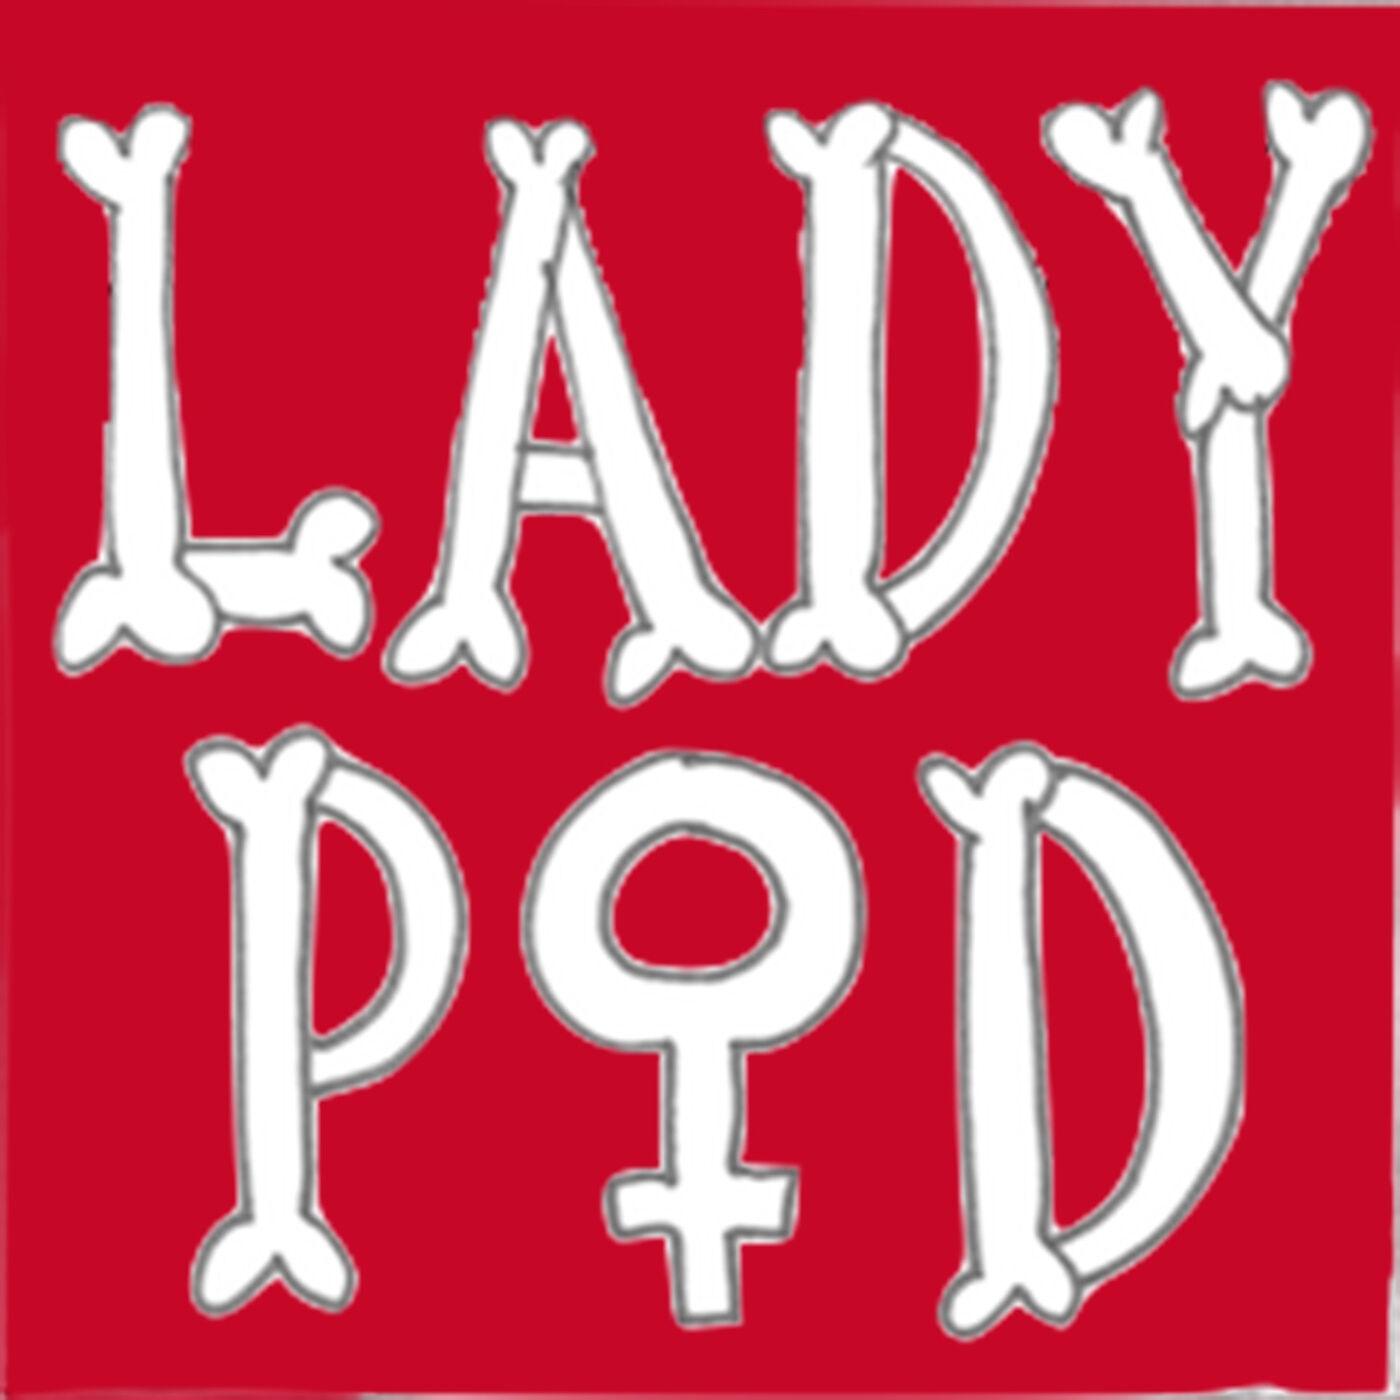 LadyPod podcast show image